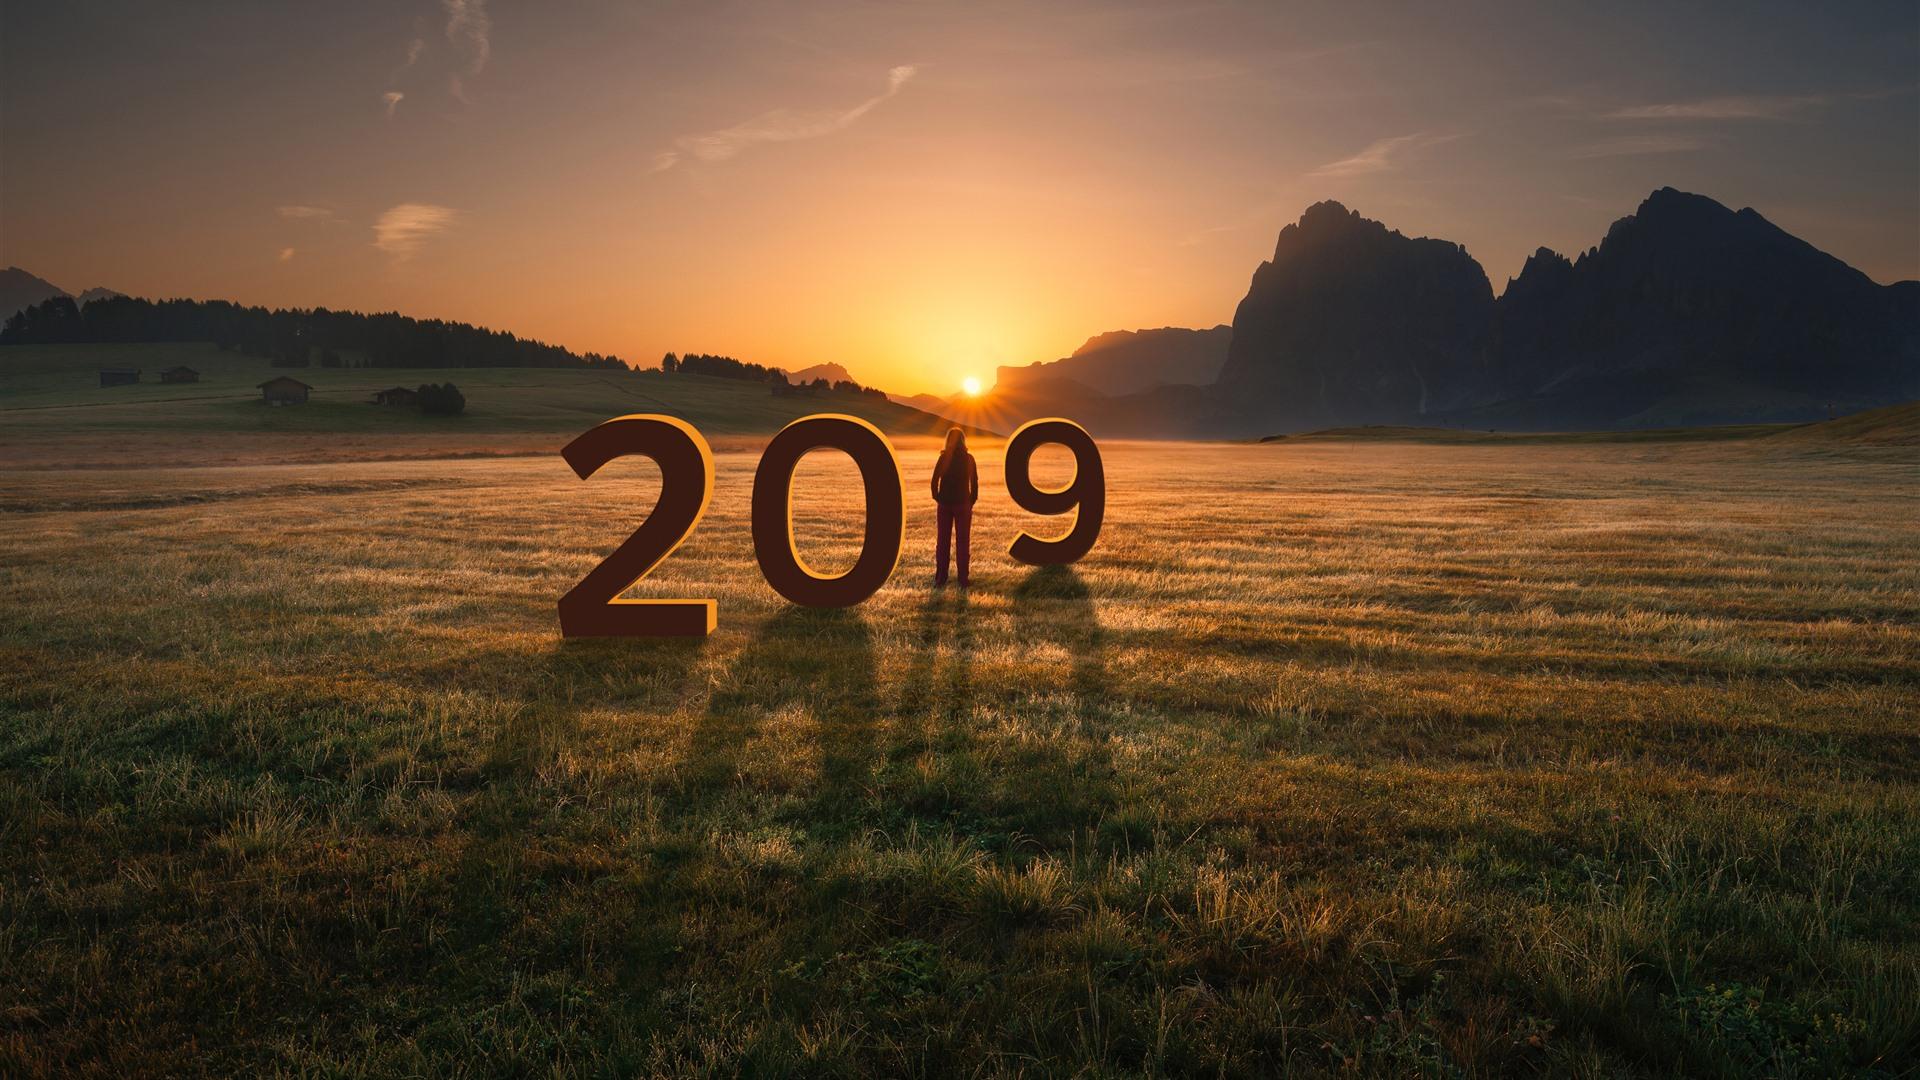 Samsung S4 Hd Wallpapers 2019: Wallpaper New Year 2019, Grass, Girl, Mountains, Sunset